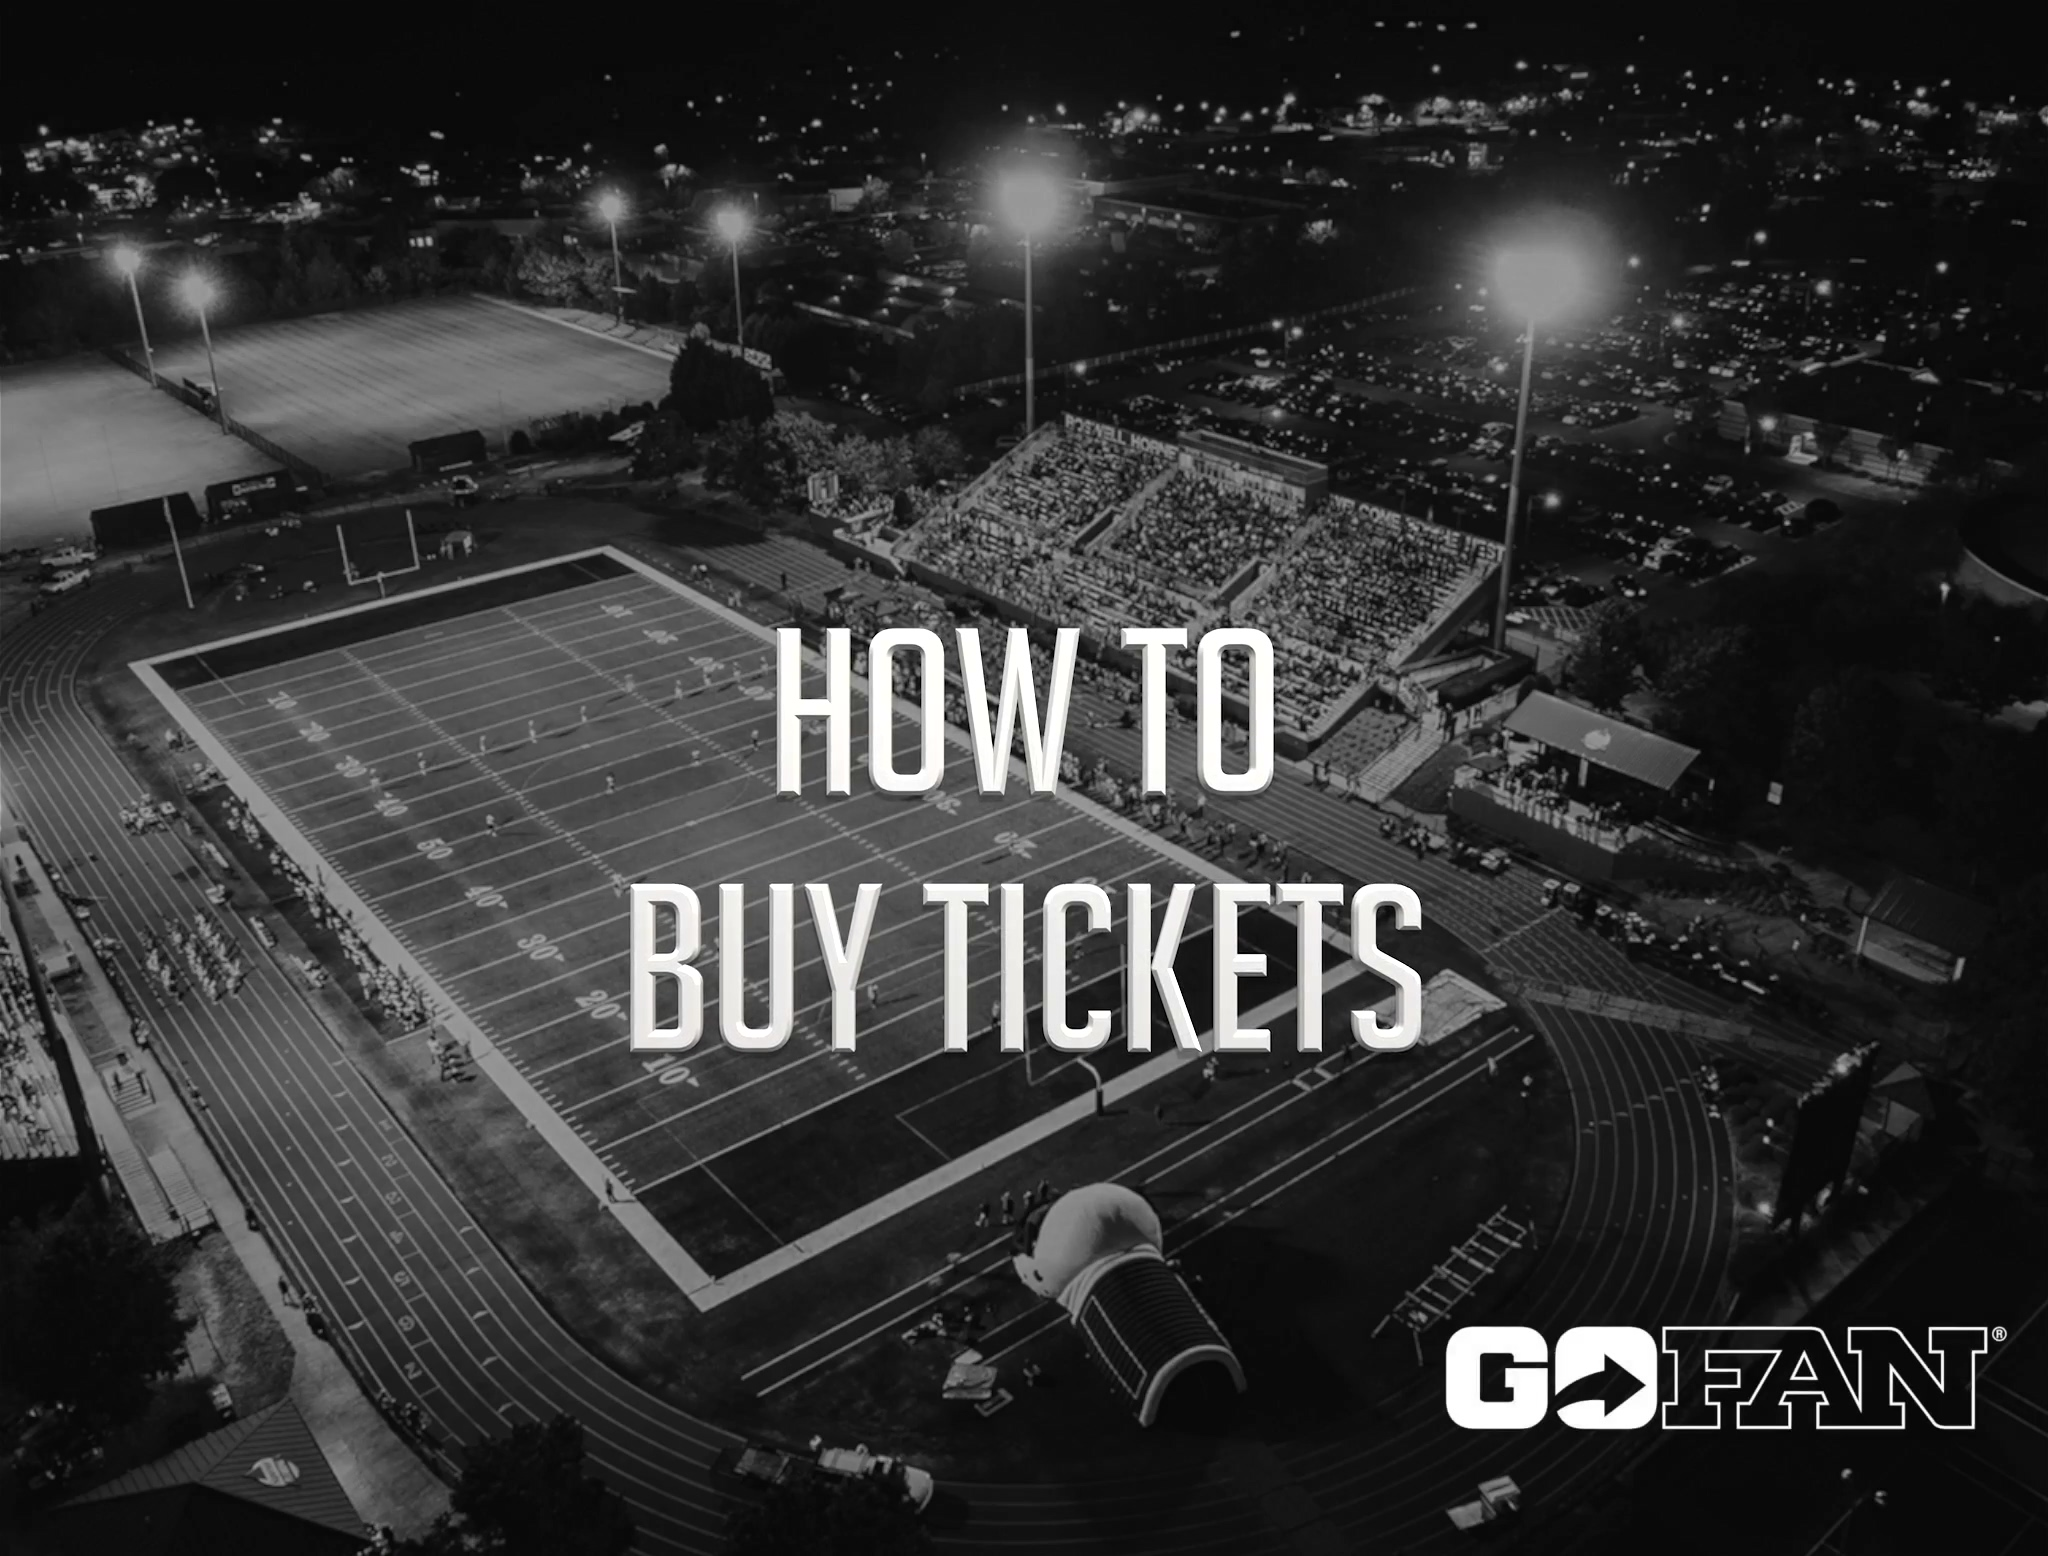 GoFan - How to Buy Tickets 090220